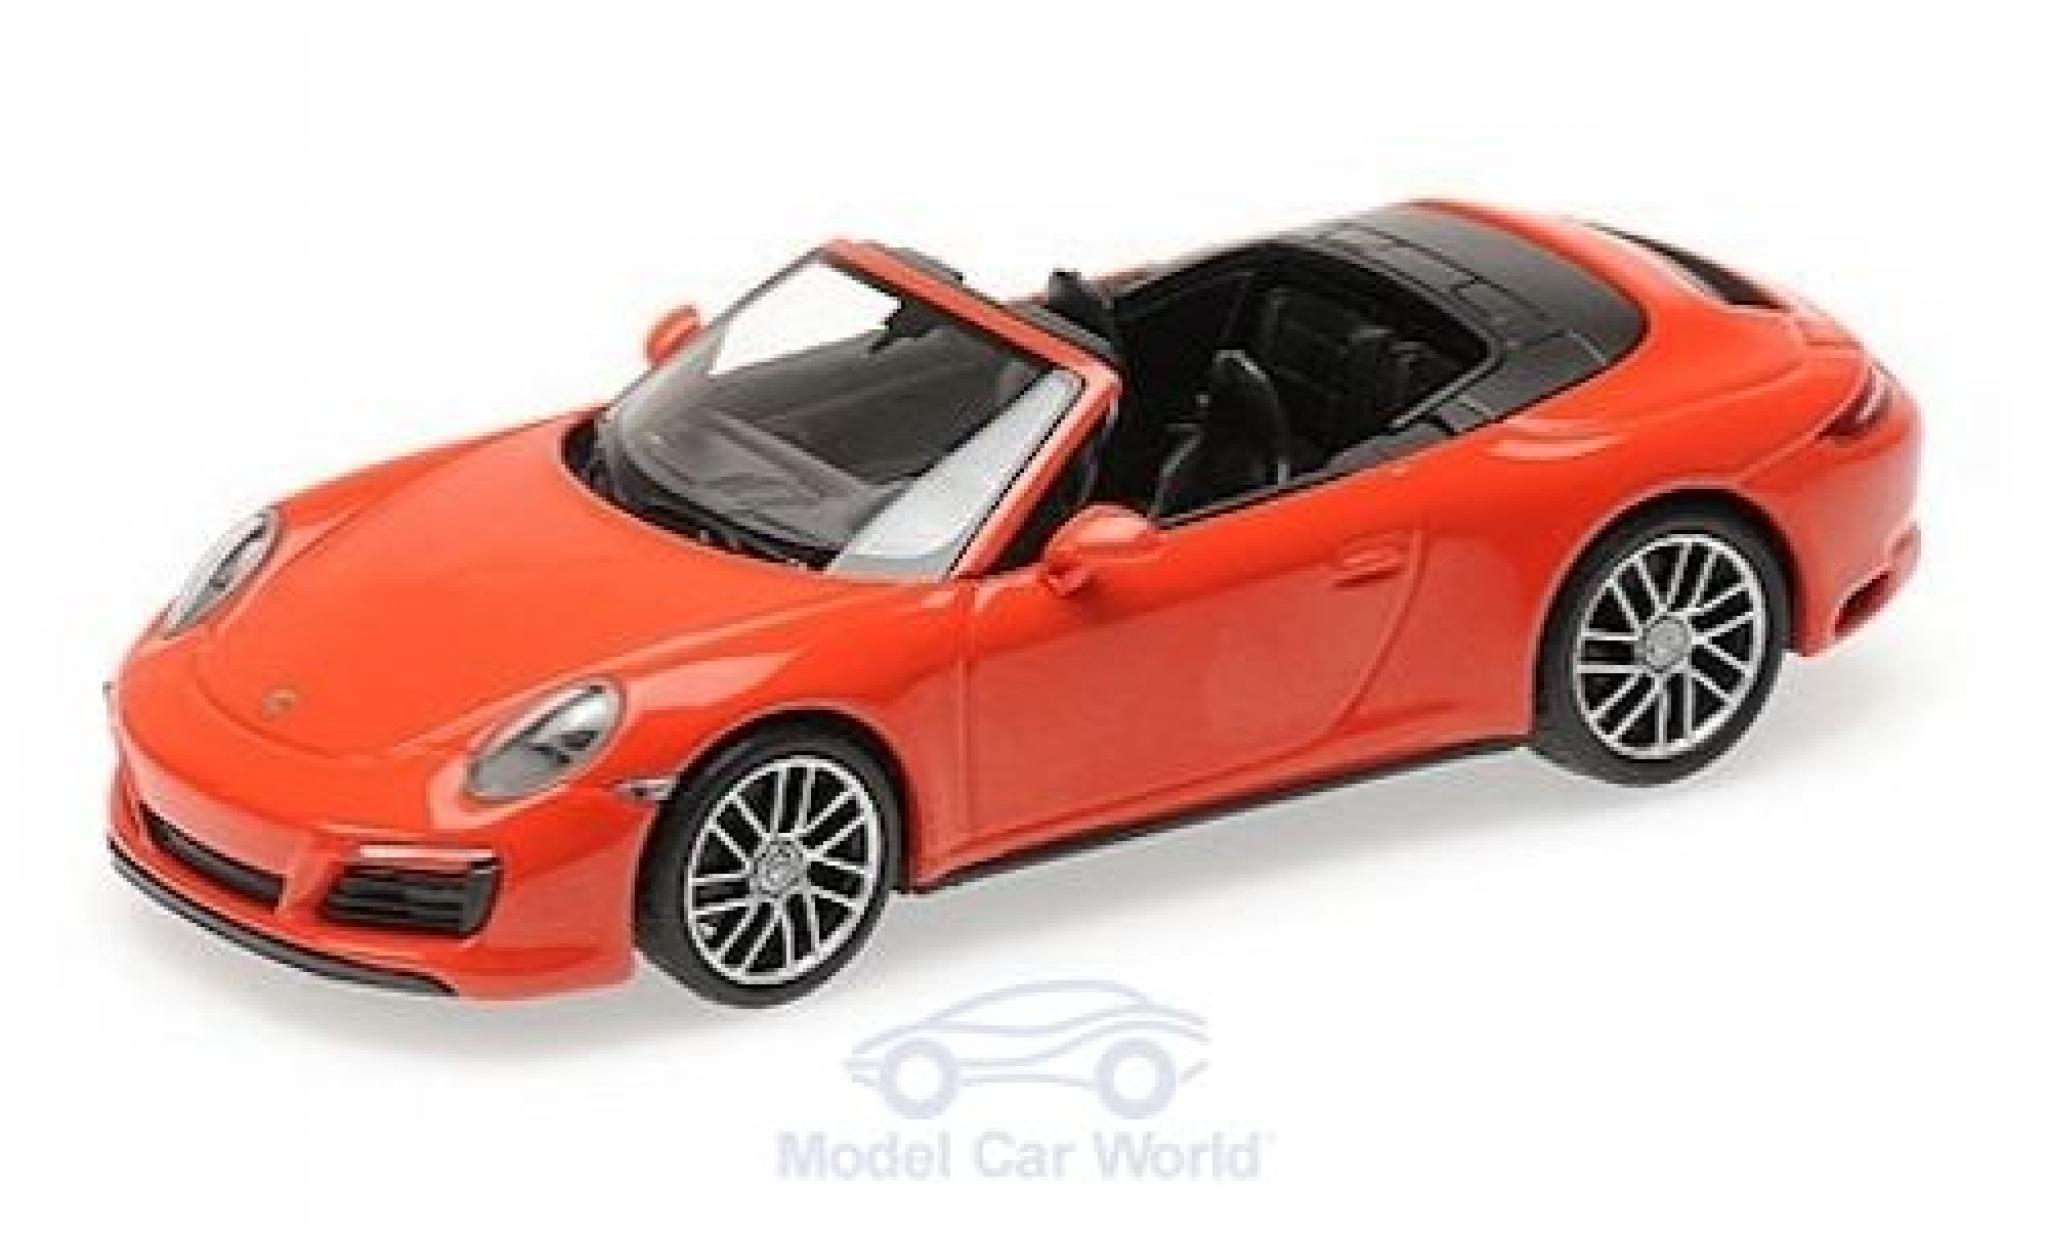 Porsche 911 1/43 Minichamps (991.2) Carrera 4S Cabriolet orange 2016